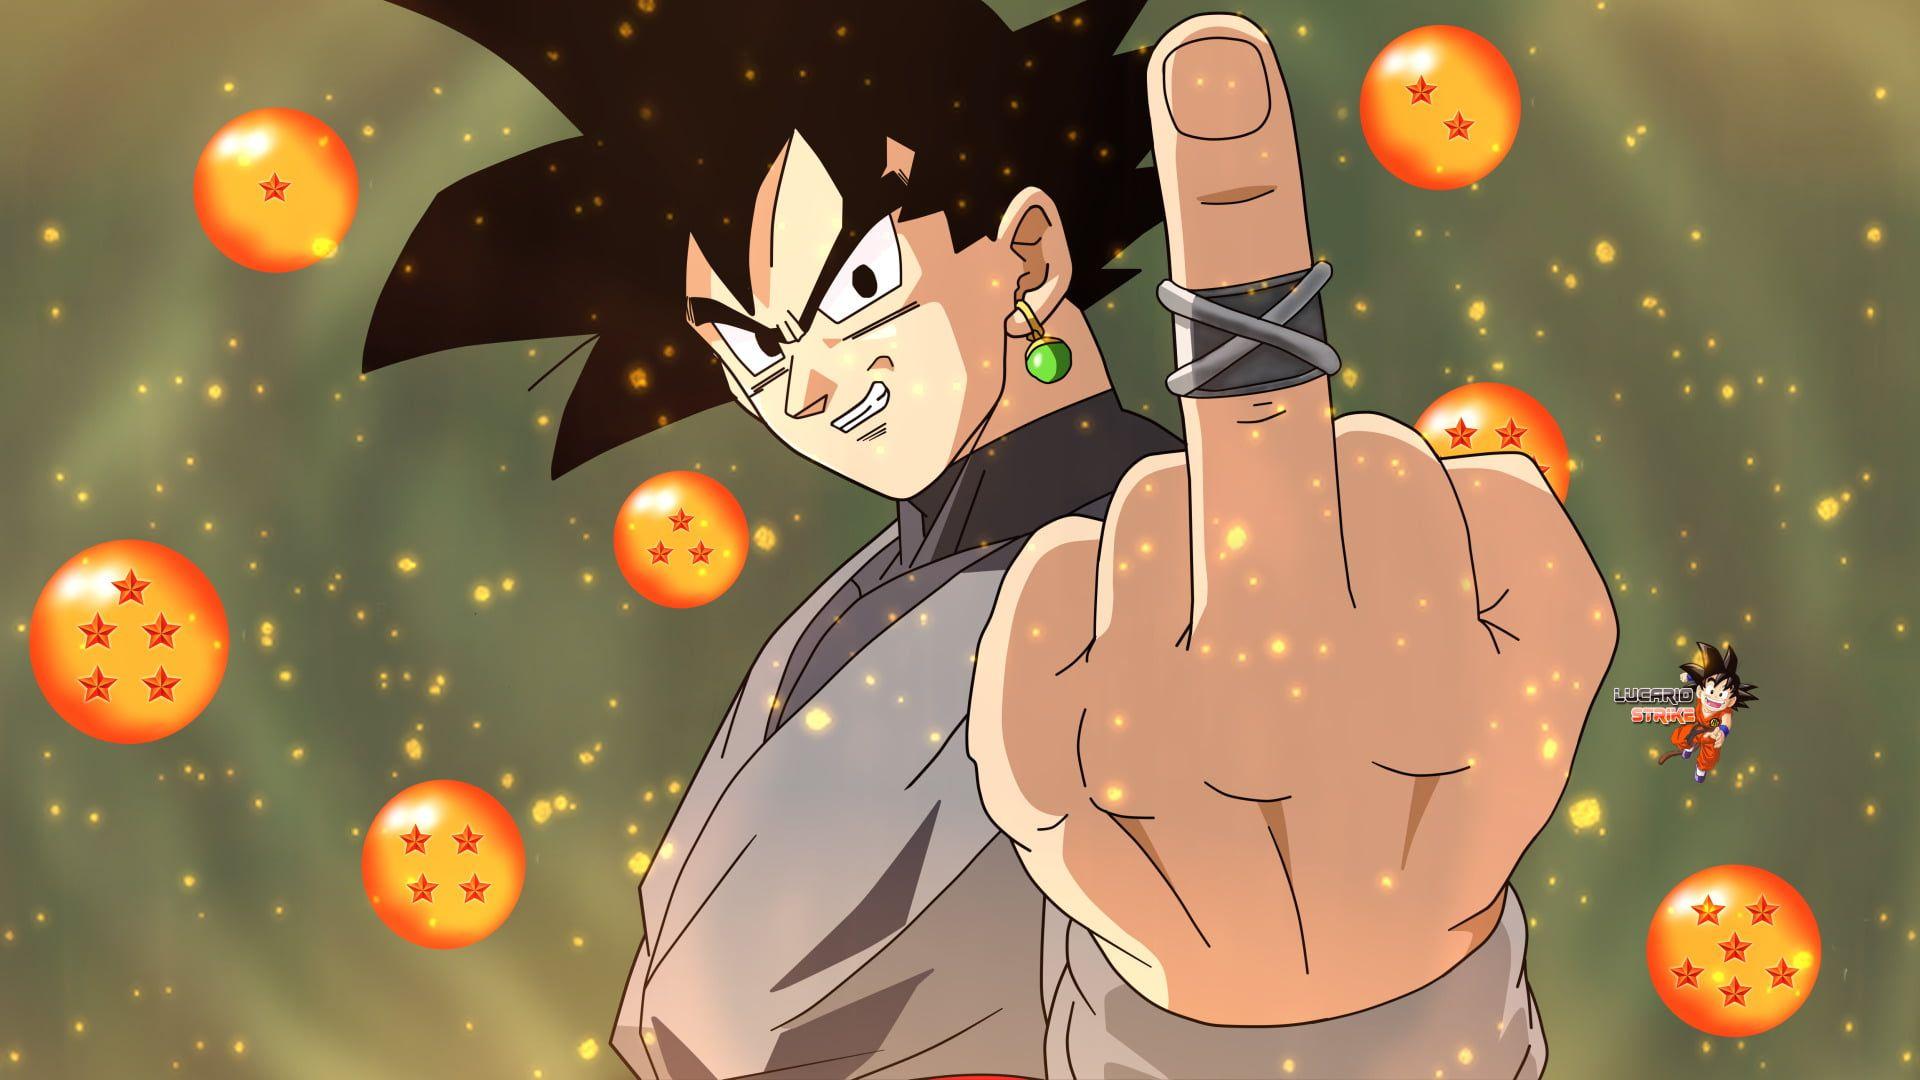 Dragon Ball Z Son Goku Dragon Ball Dragon Ball Super Black Goku 1080p Wallpaper Hdwallpaper Desktop In 2020 Goku Wallpaper Dragon Ball Wallpapers Goku Black